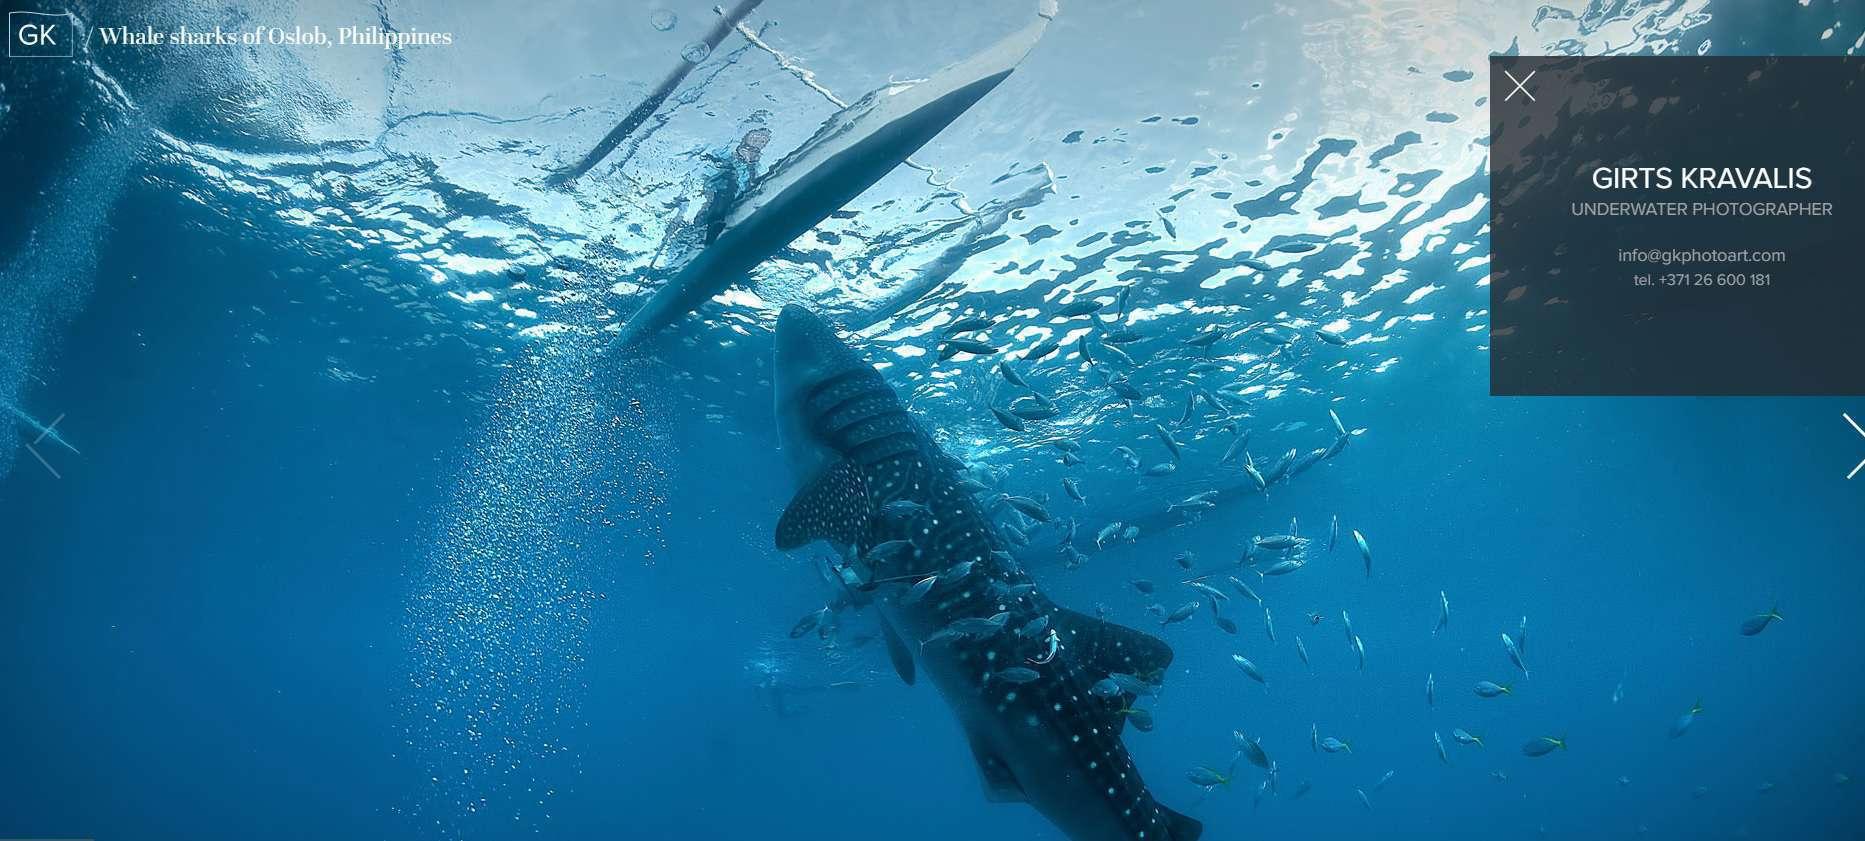 Whaleshark by GK